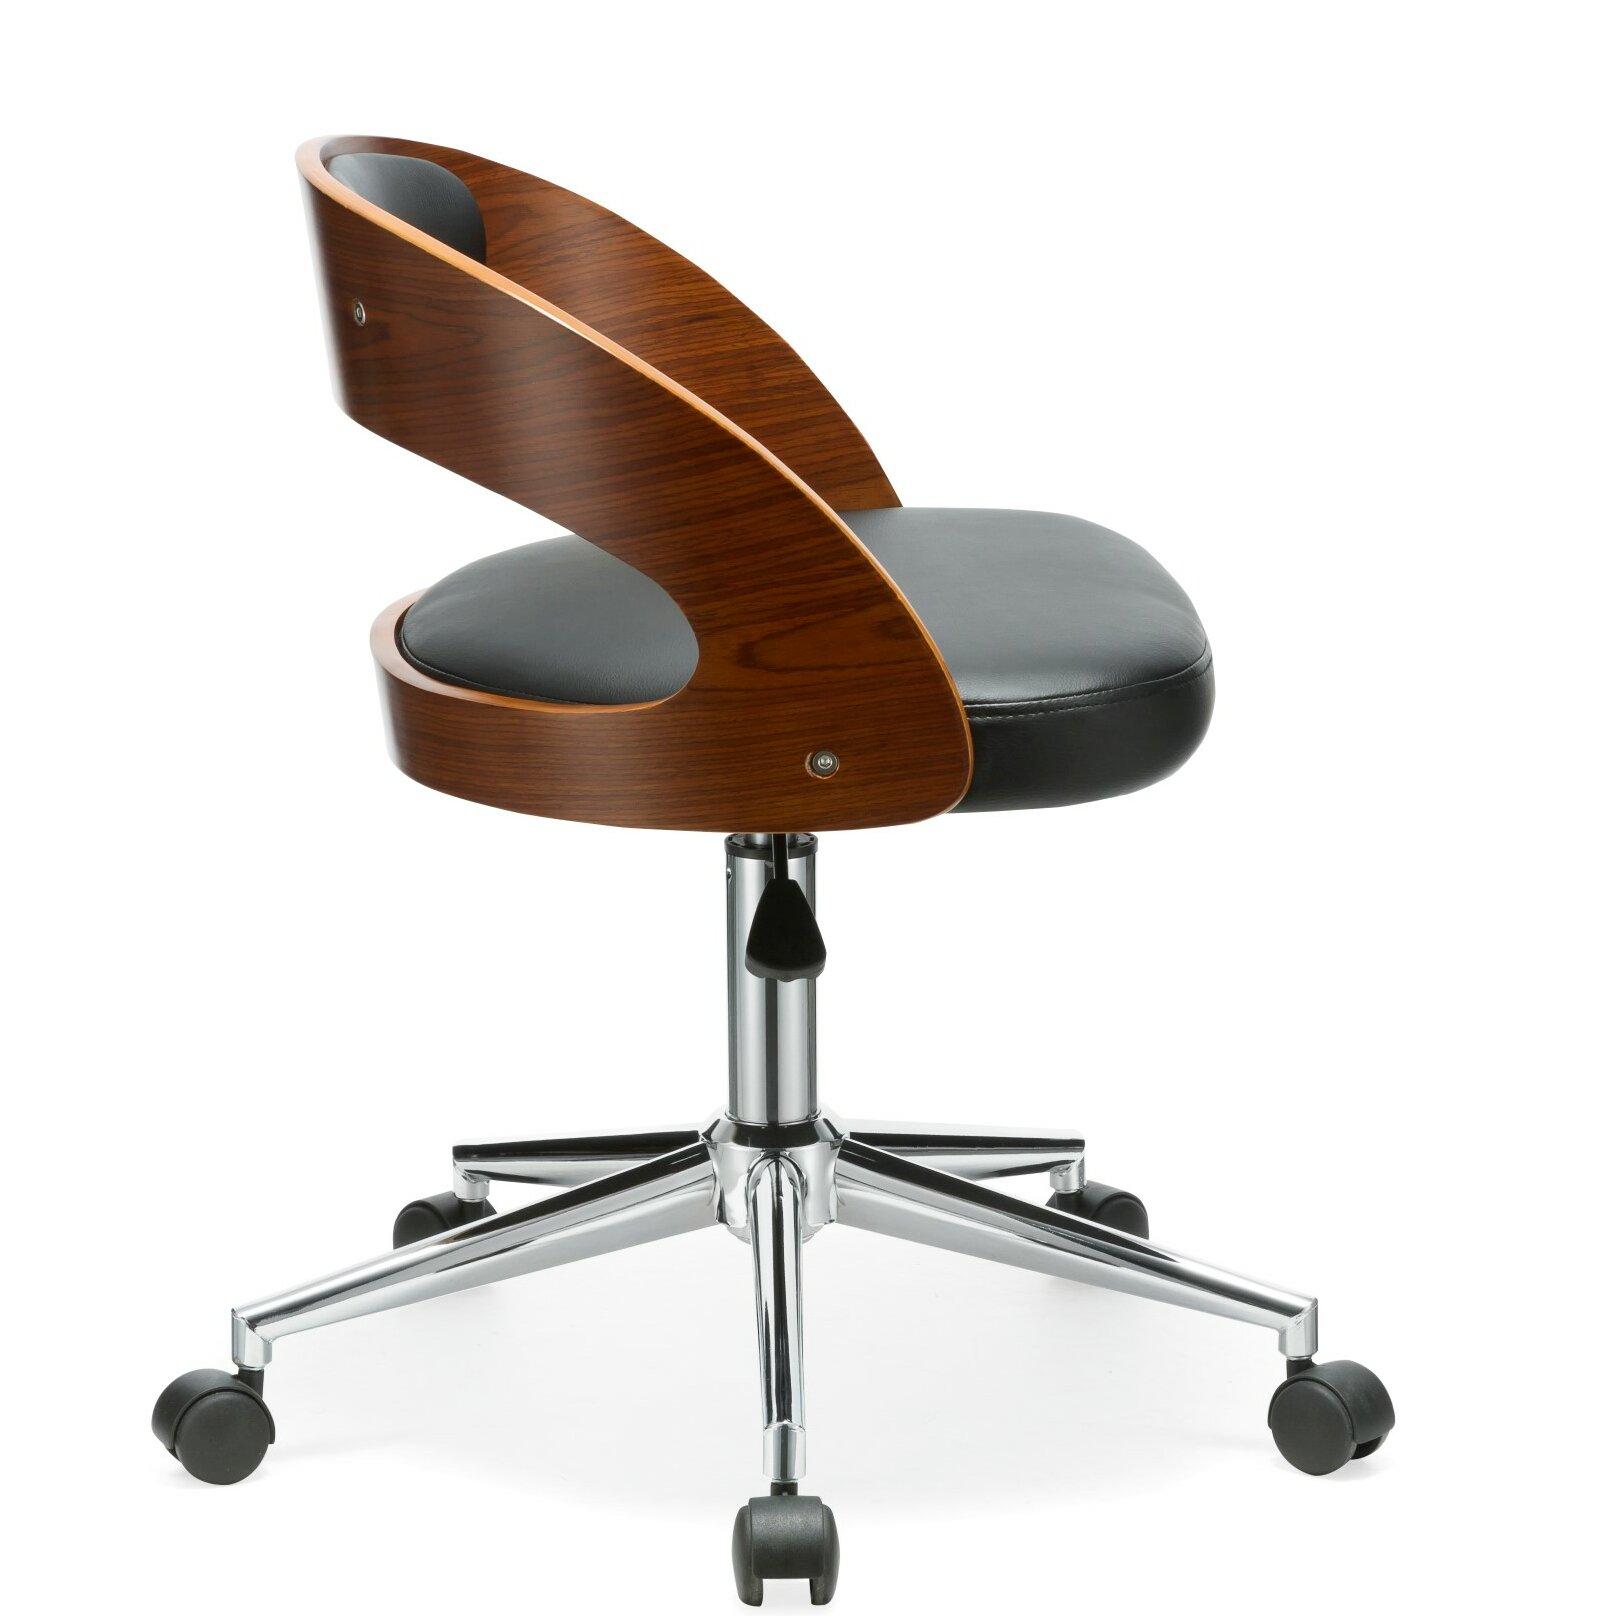 Porthos Home Sibley Desk Chair & Reviews | Wayfair.ca